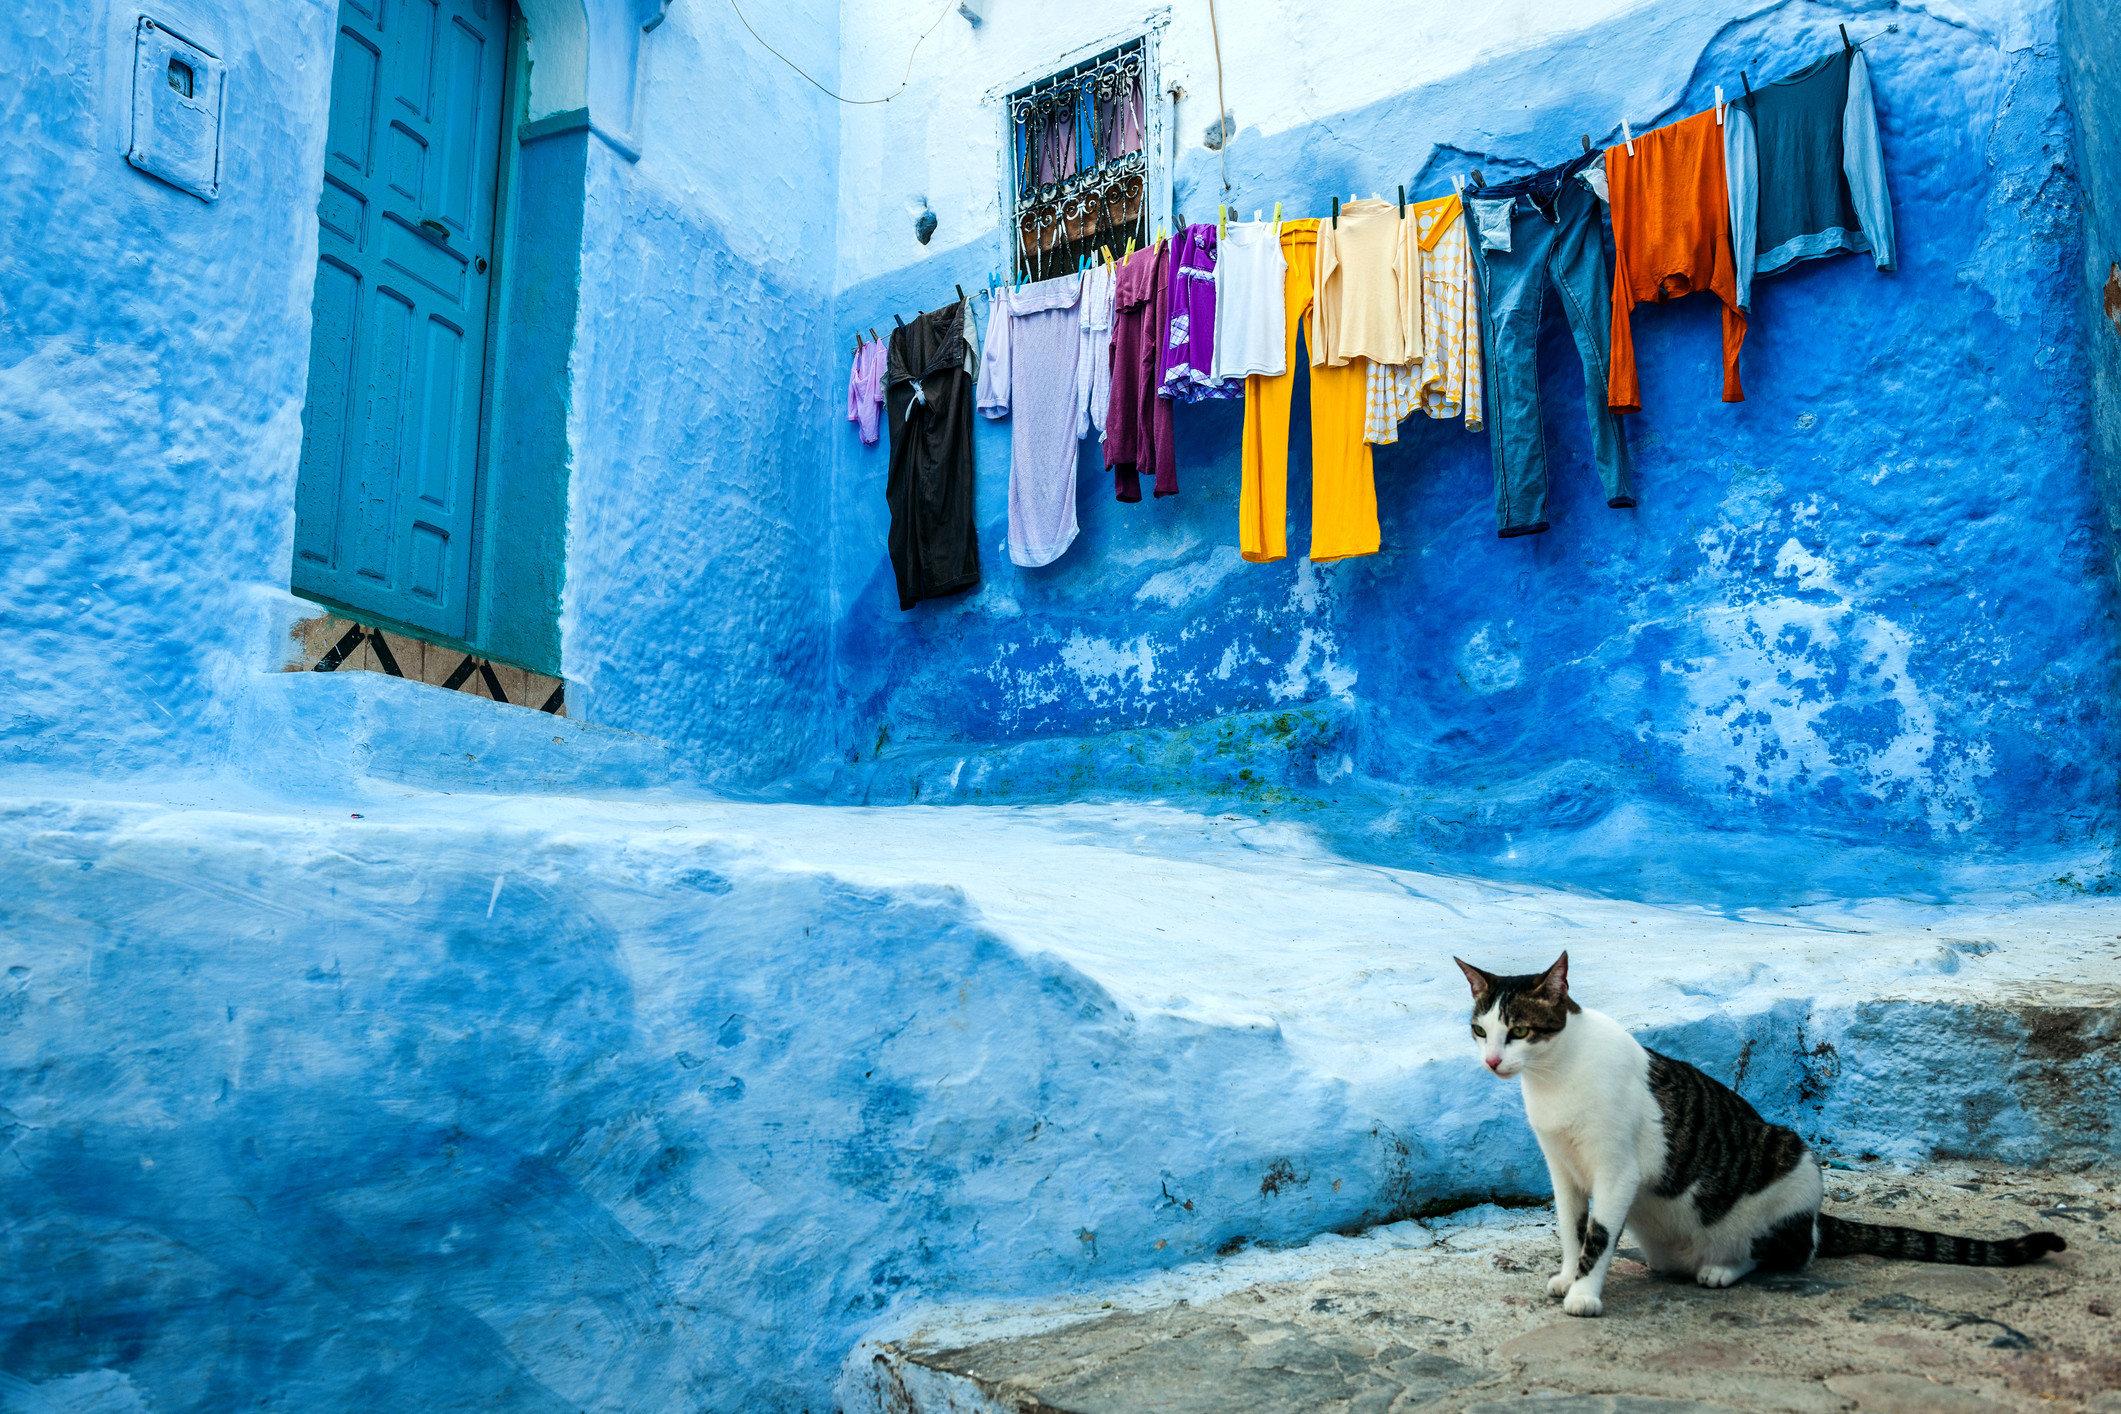 Offbeat Trip Ideas color blue Winter snapshot indoor water season vacation Sea snow ice colored